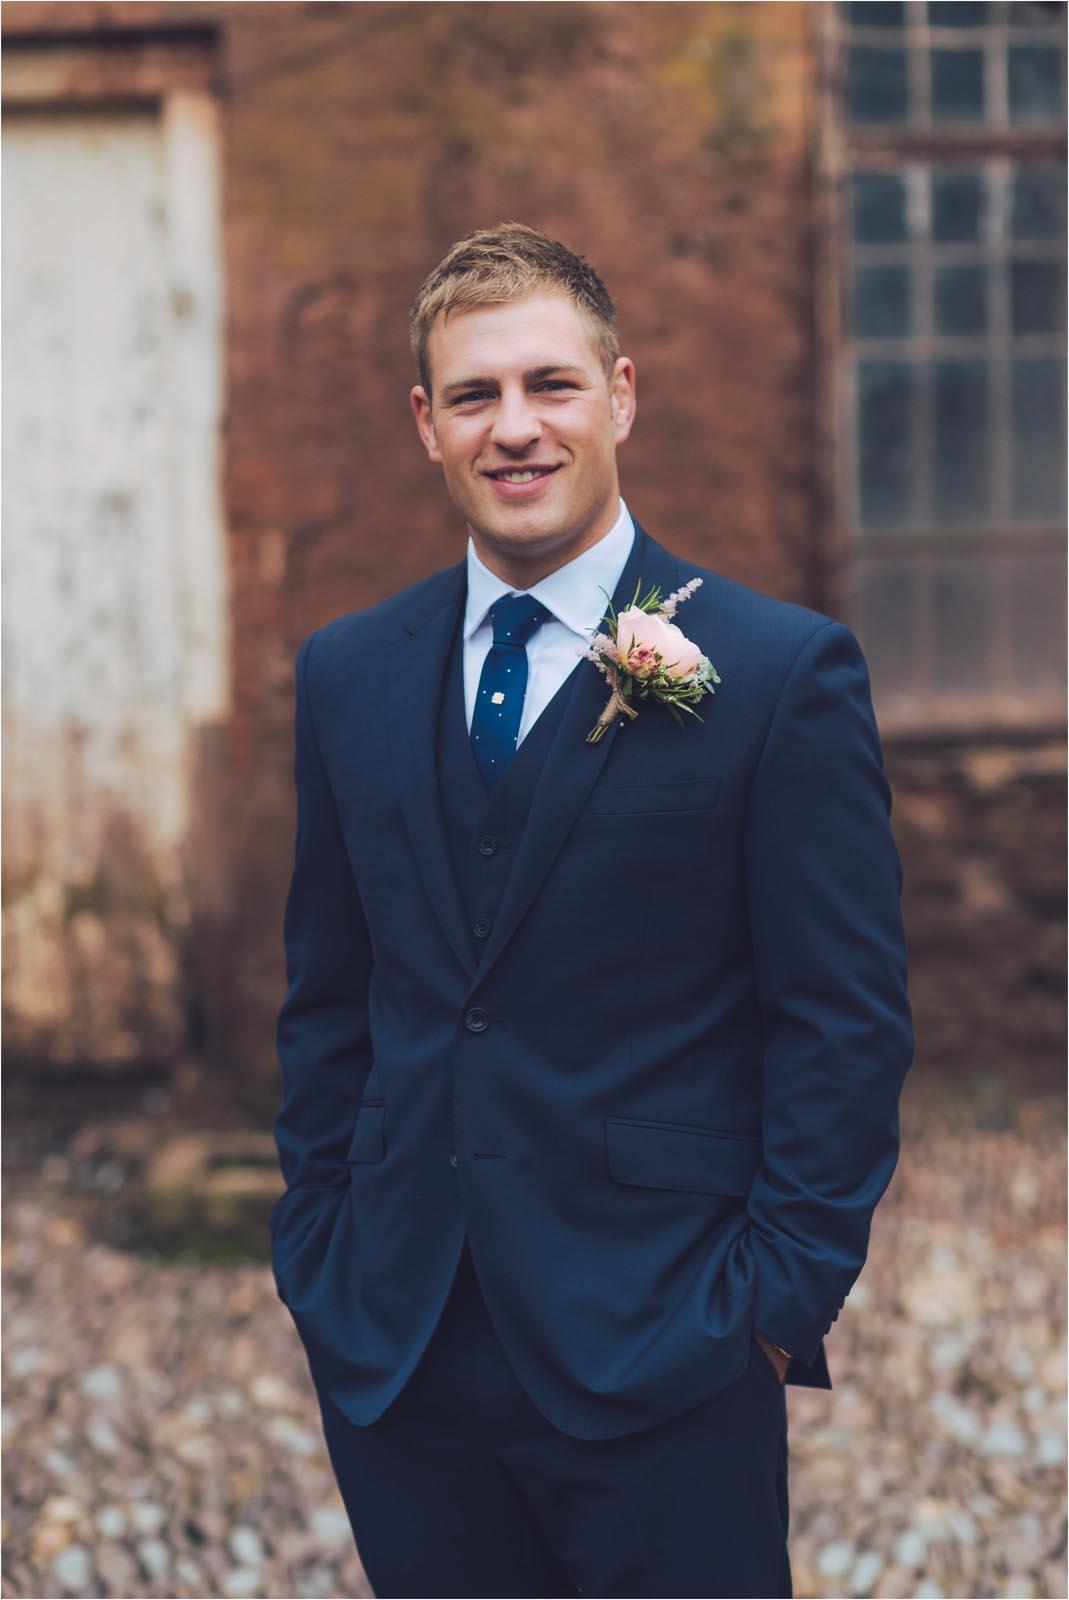 Simon biffen wedding photography 0034